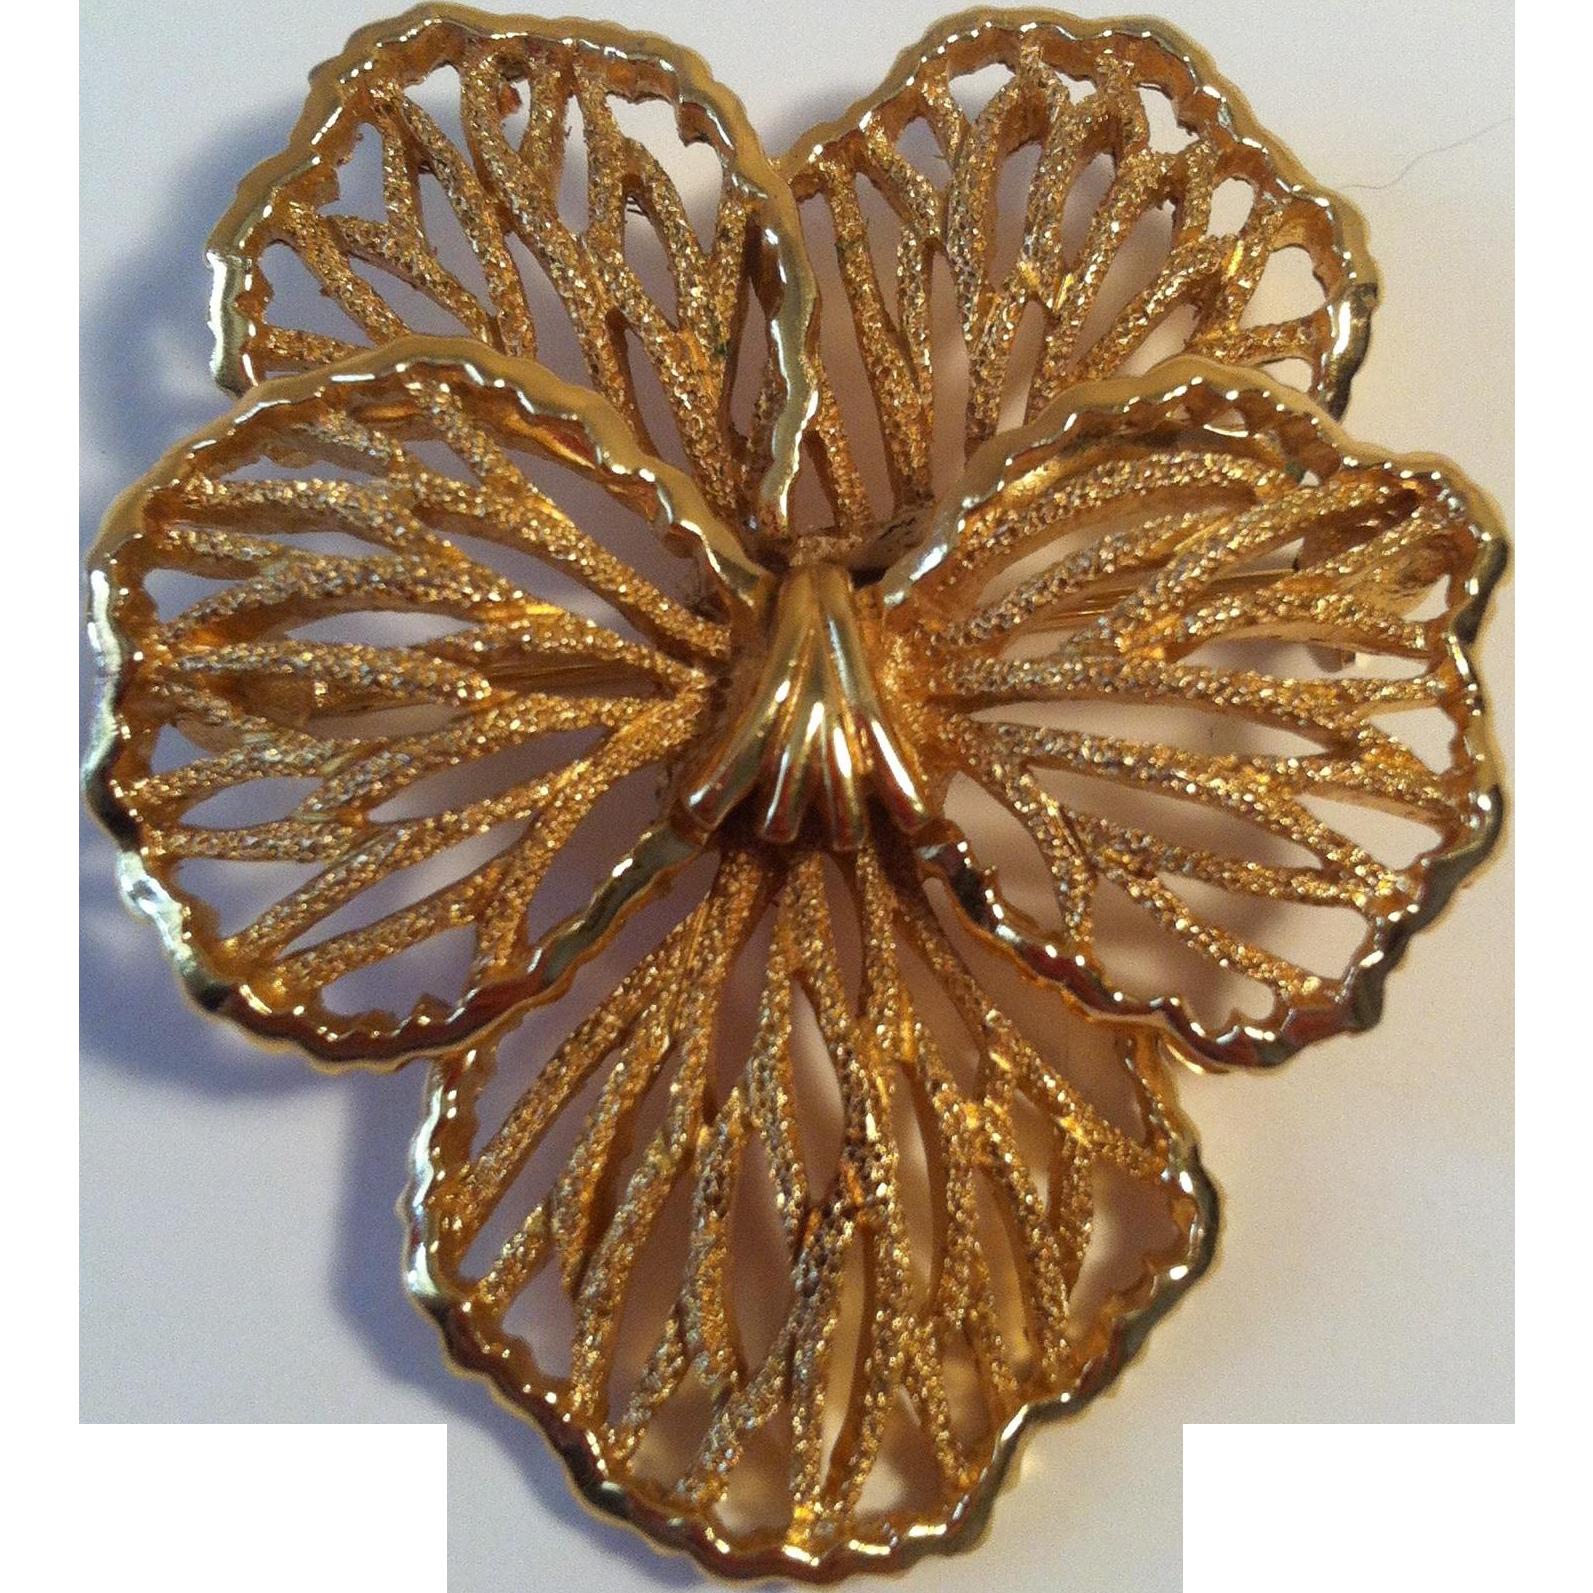 Crown Trifari Filigree Pansy Brooch